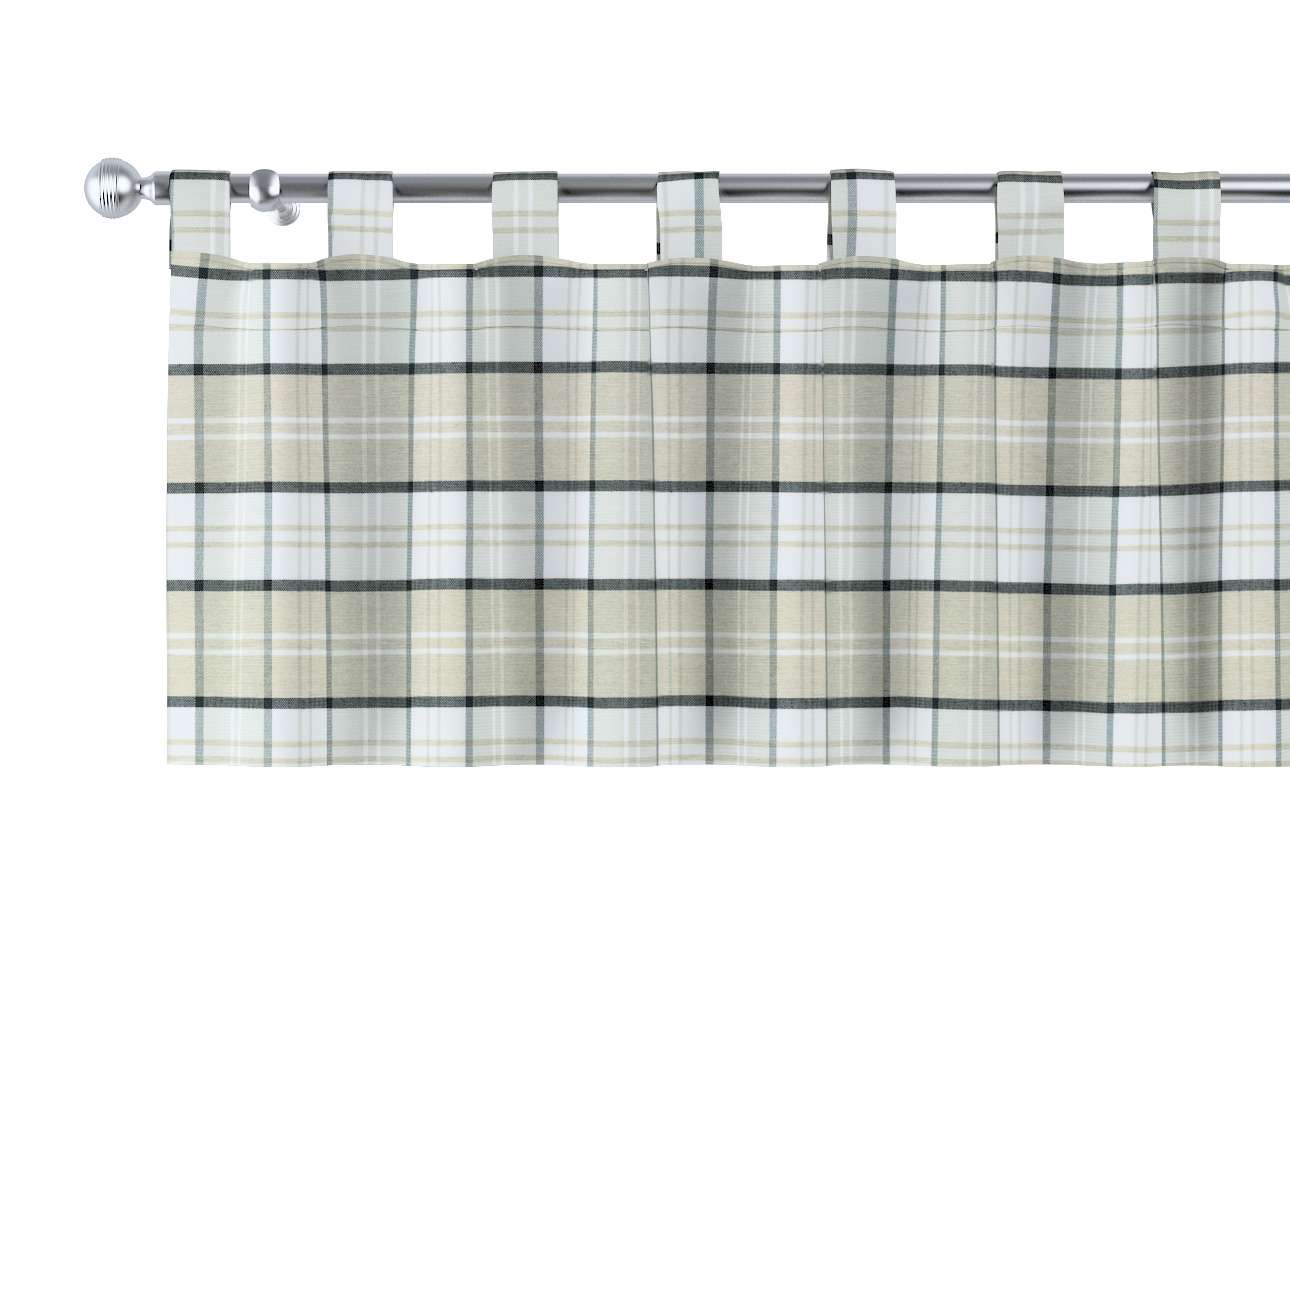 Lambrekin na szelkach w kolekcji Bristol, tkanina: 143-64